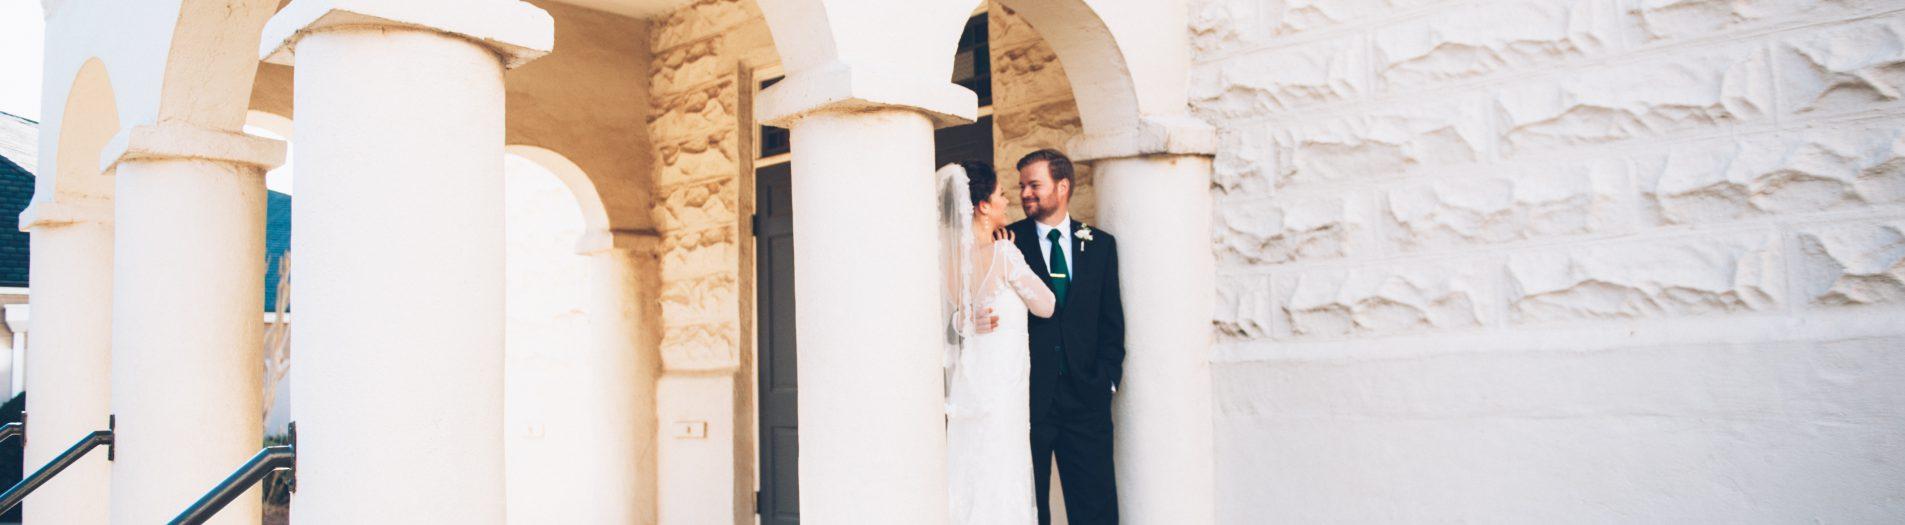 Alexis & Wiley | Midway Presbyterian + Winter Wedding